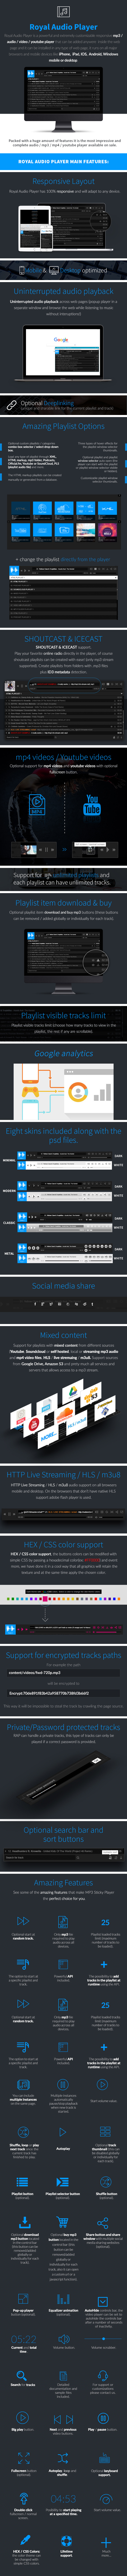 Royal Audio Player WordPress Plugin - 7